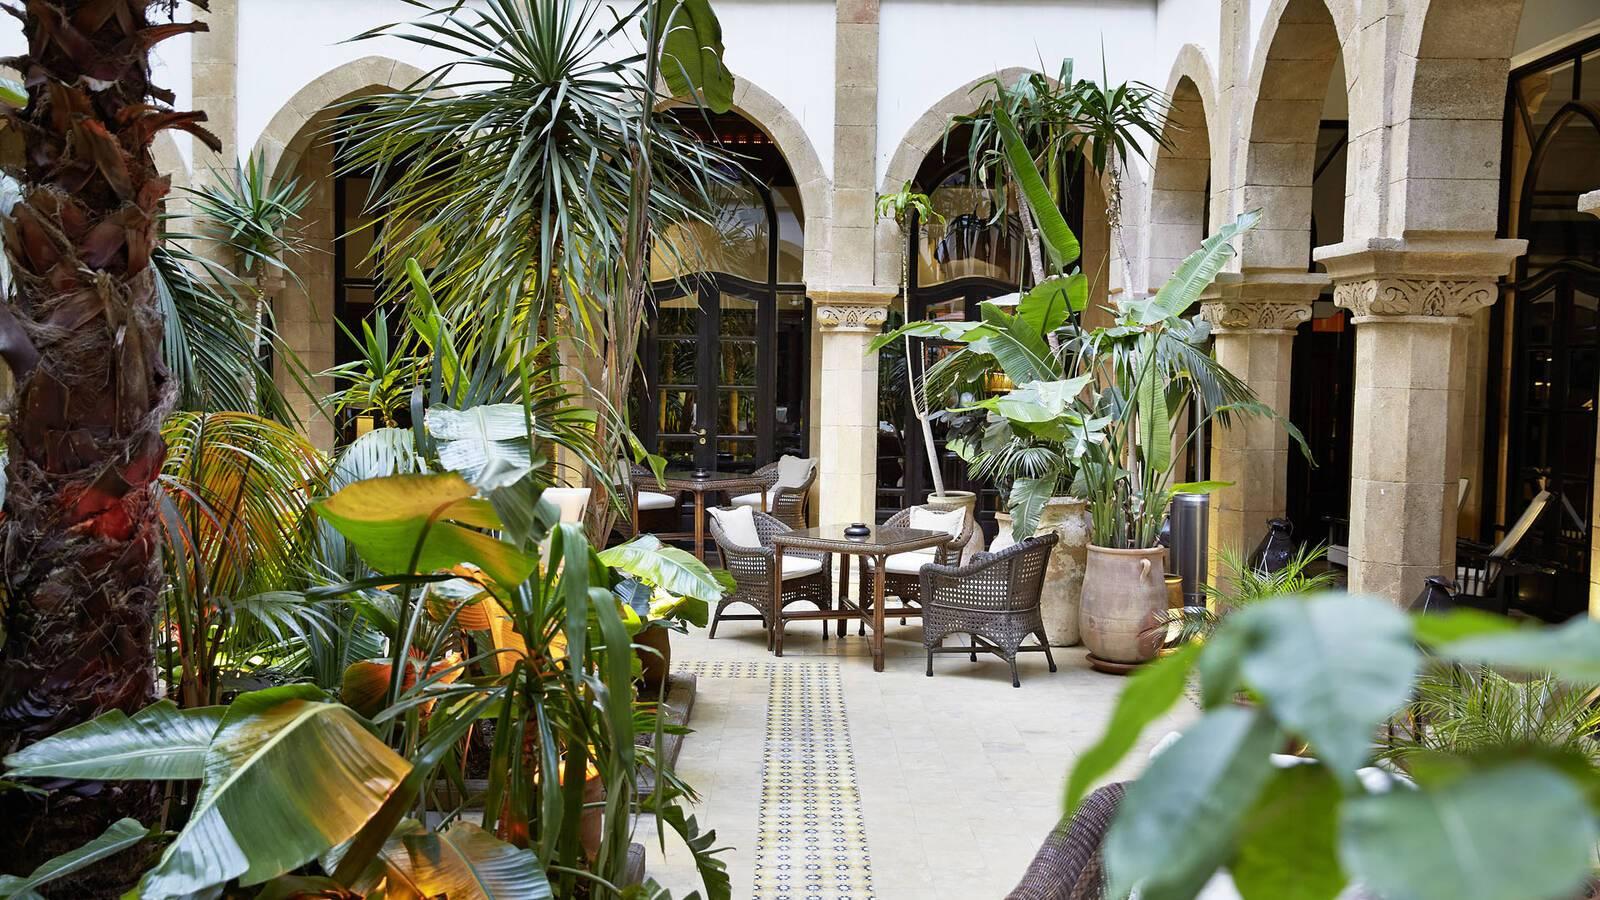 Heure Bleue Essaouira Patio